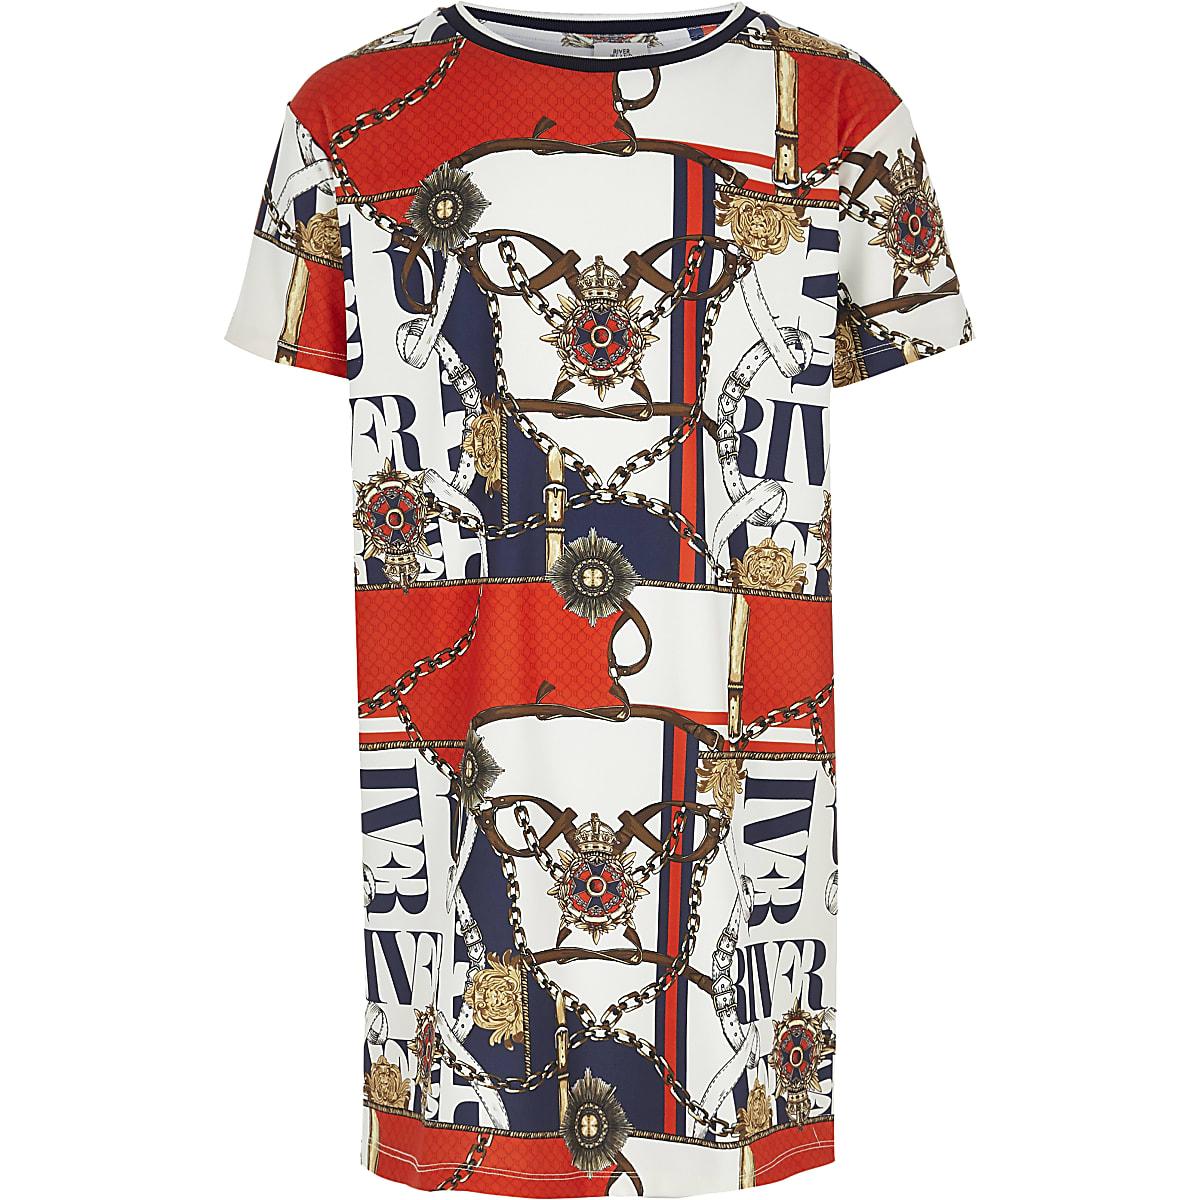 f1ccfd4de0 Girls white printed T-shirt dress - Day Dresses - Dresses - girls